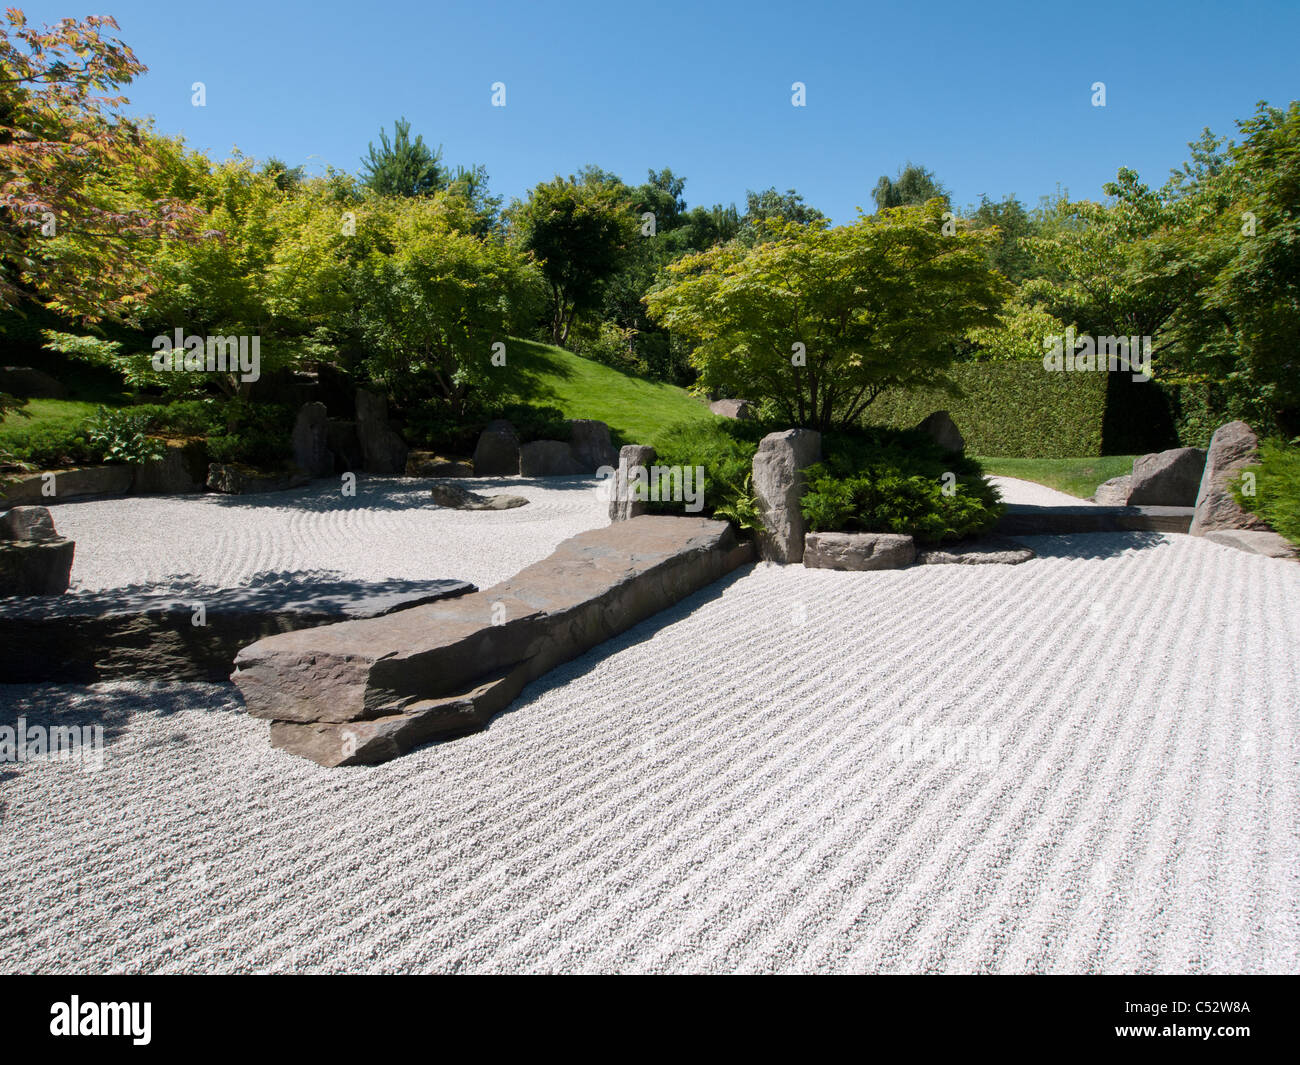 The Japanese Garden at the Garten der Welt in Marzahn district of Berlin Germany - Stock Image